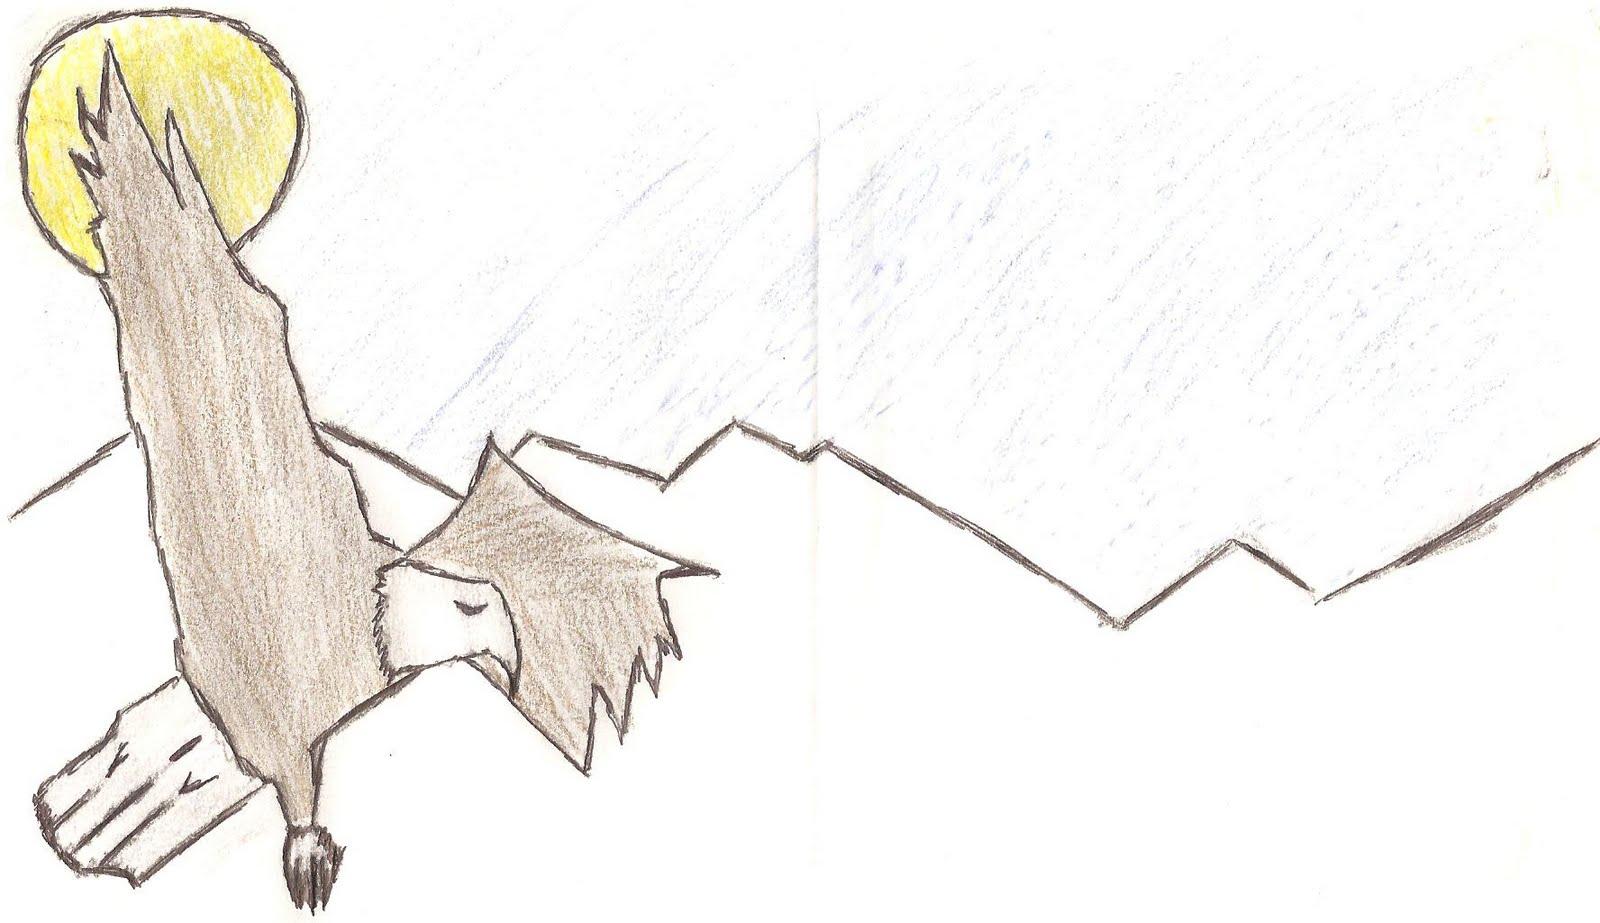 http://3.bp.blogspot.com/_xpE1FpQmWuk/S8pZetAQECI/AAAAAAAACBk/IAFQhF3M2E4/s1600/Eagle+drawing.jpg